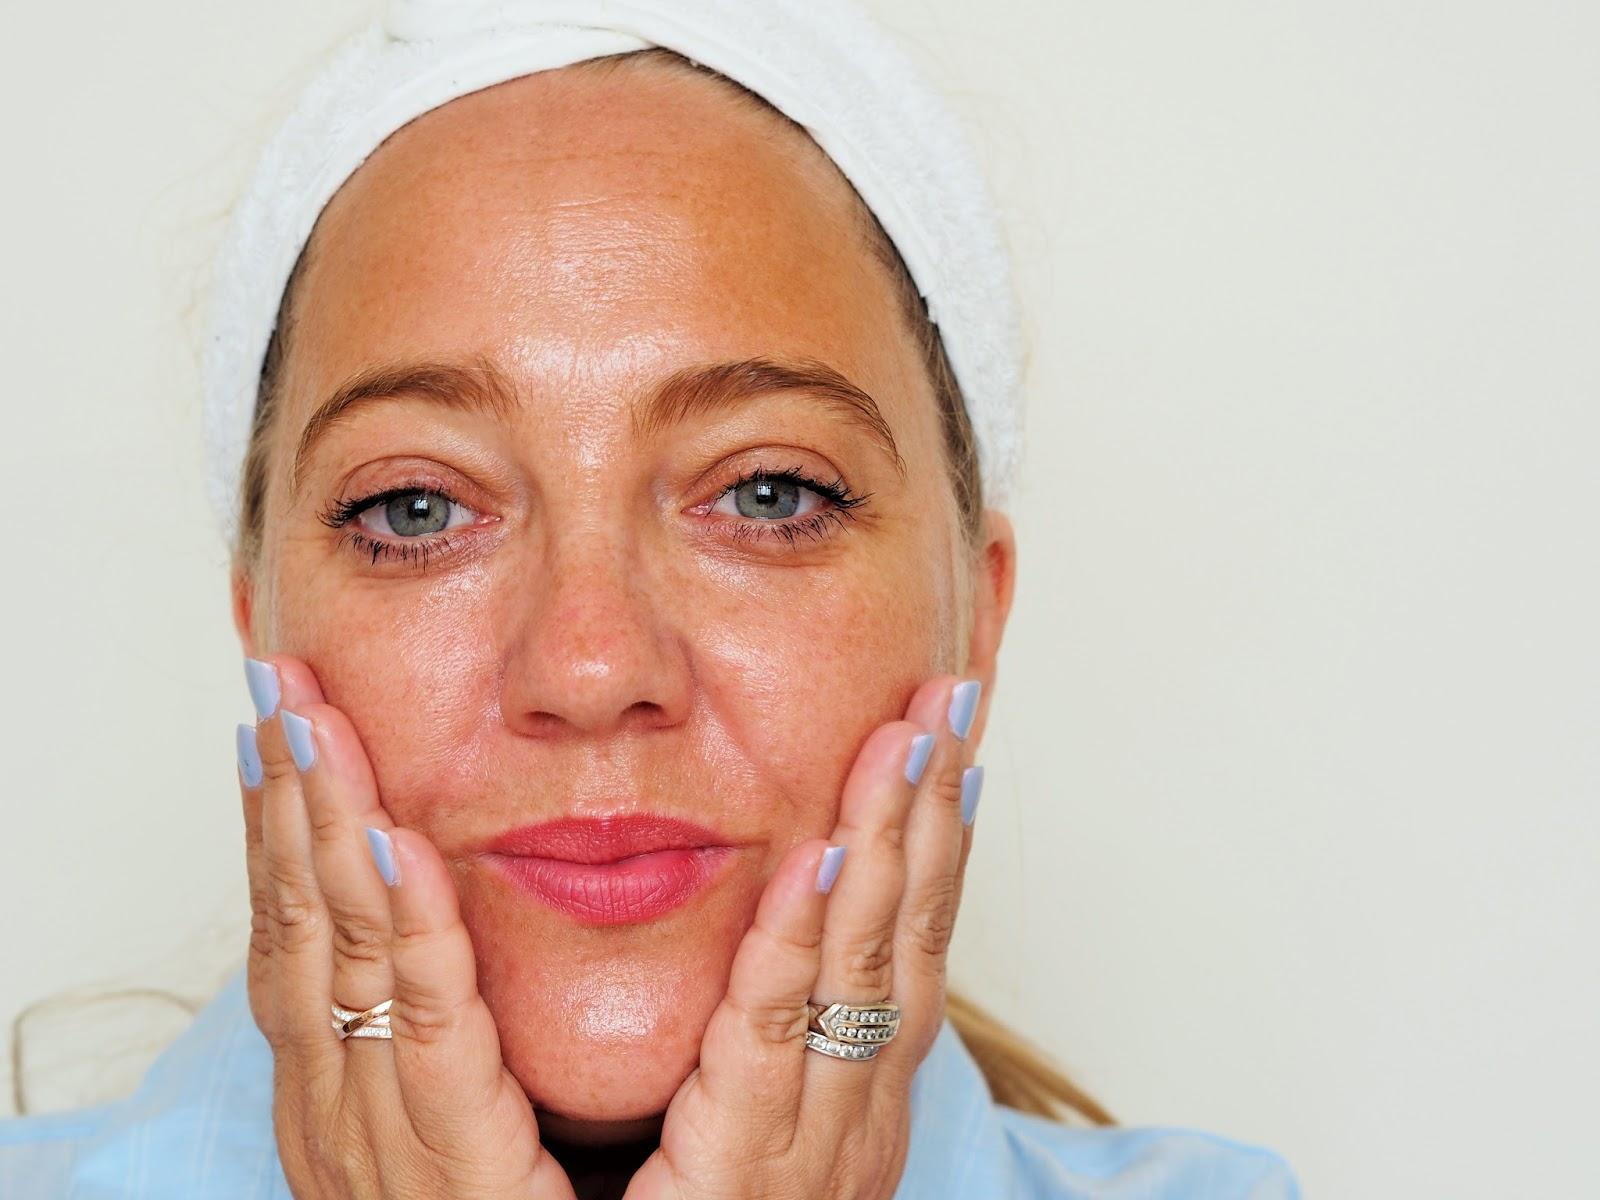 applying elemis pro collagen marine oil